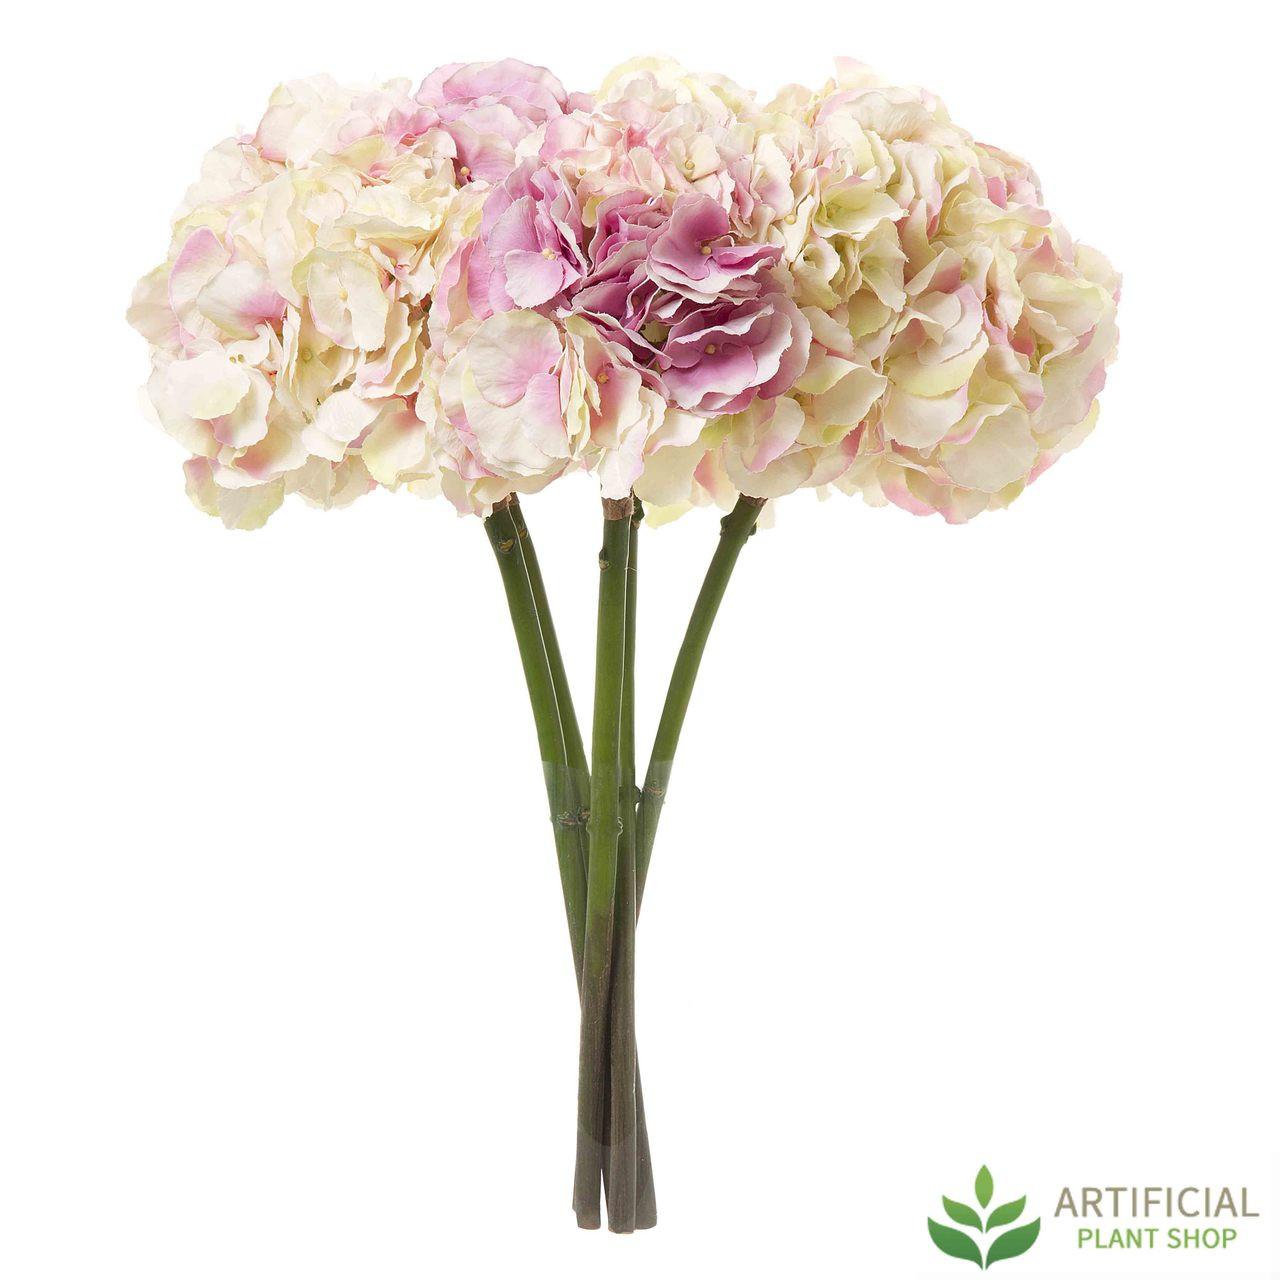 Pink Hydrangea flower bundle